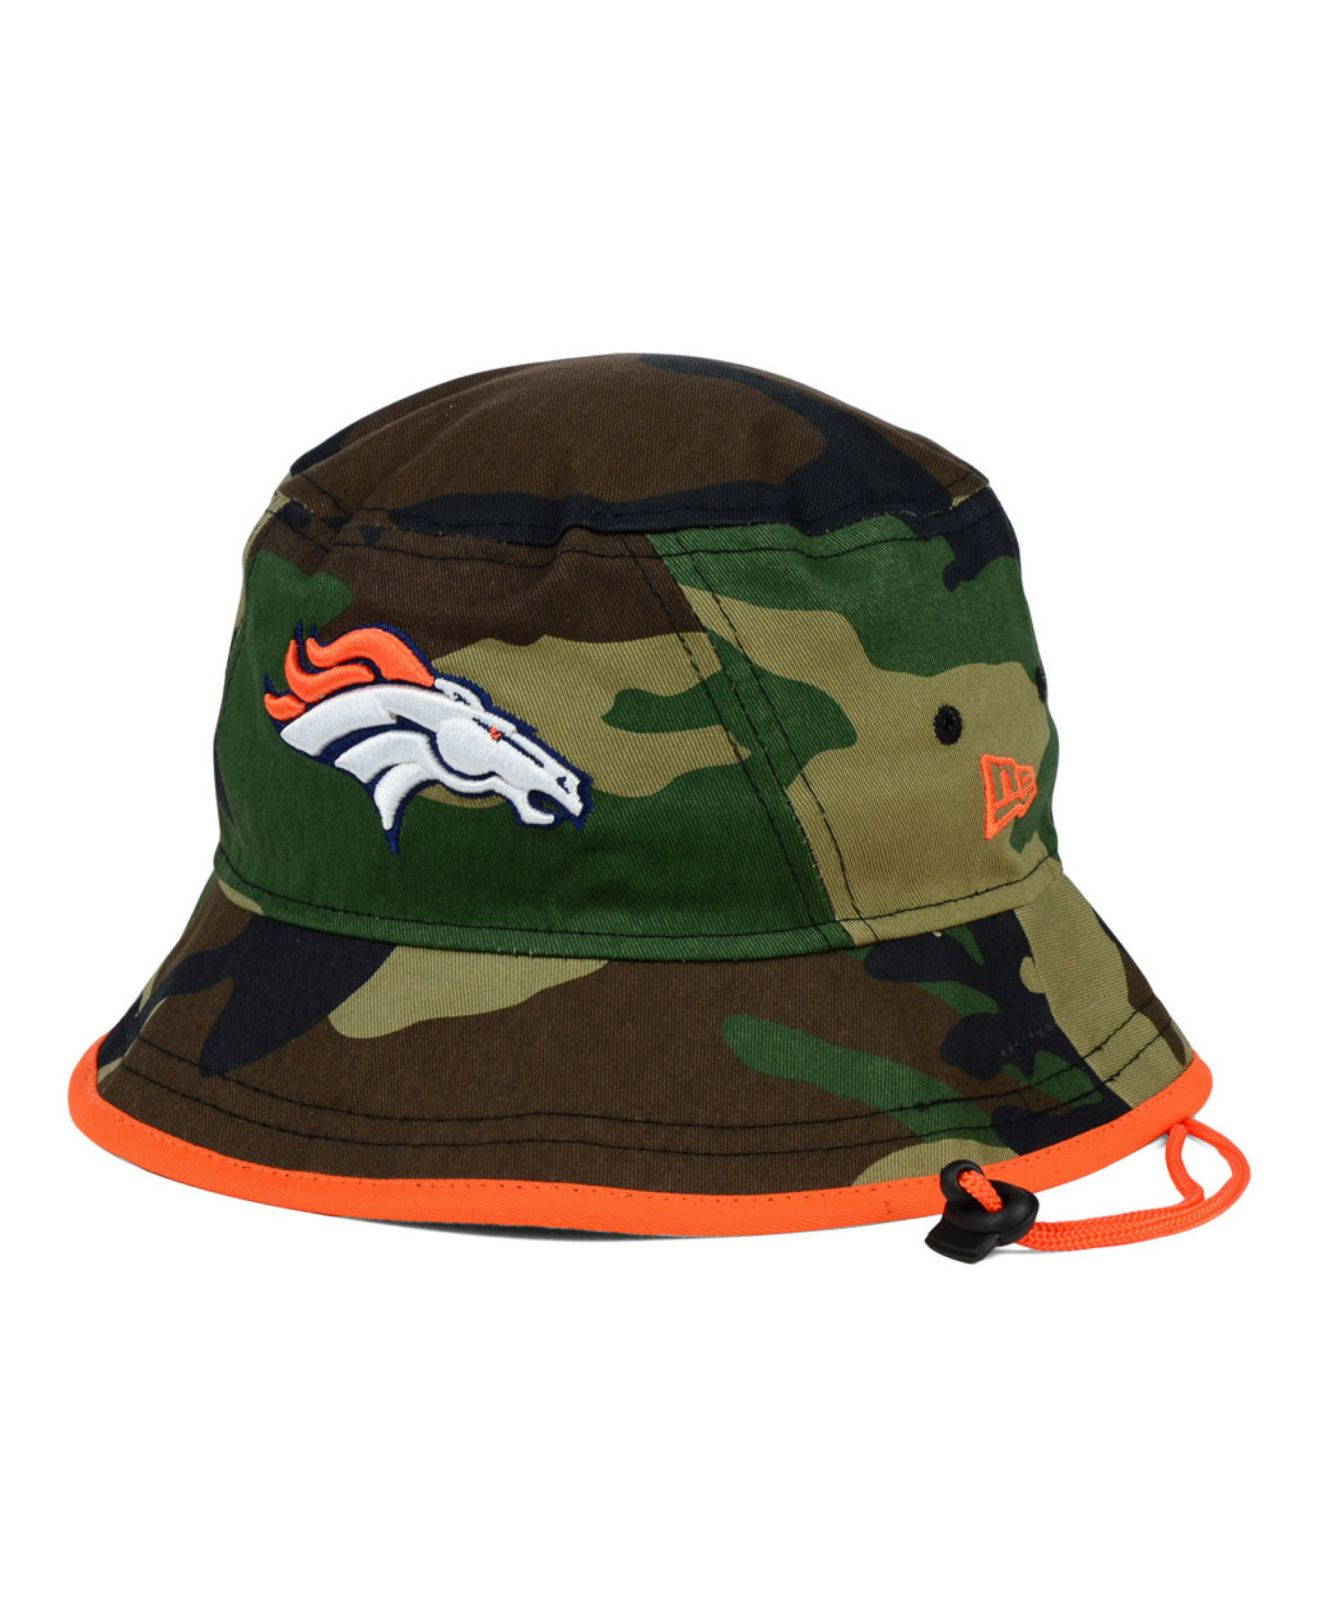 043147e615ba9 ... closeout lyst ktz denver broncos camo pop bucket hat in green for men  740d8 94a4b